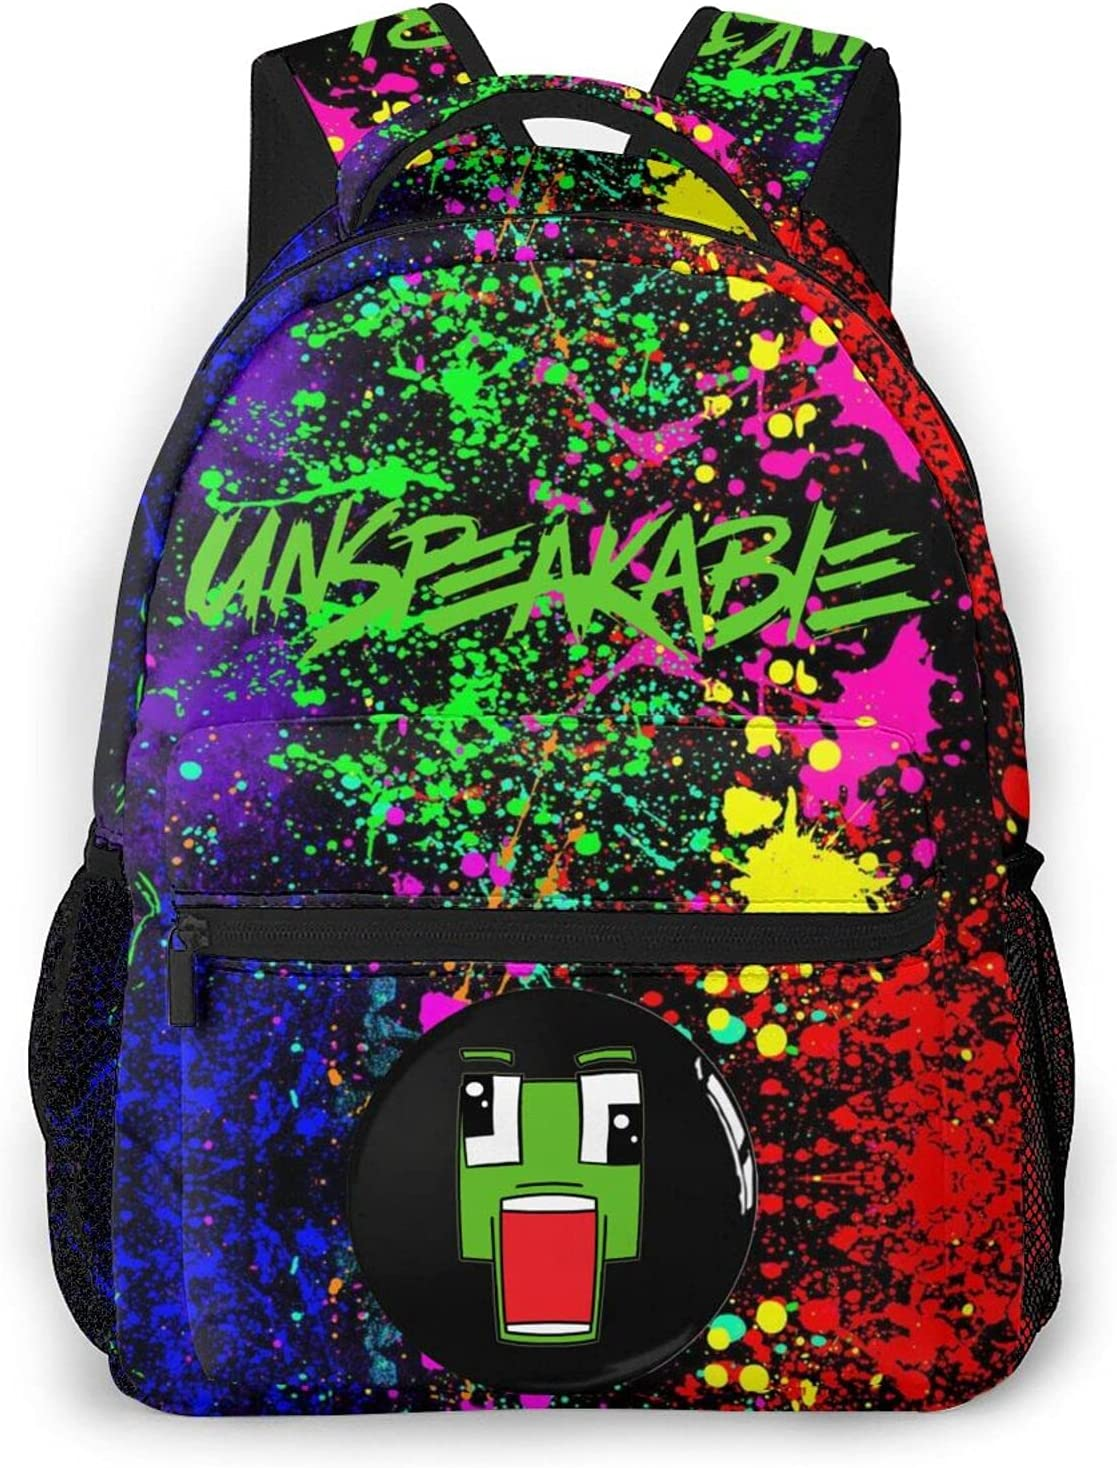 Kids 激安通販 Uns-Peakable School Backpack For Boys 商品 Girls Dur Lightweight